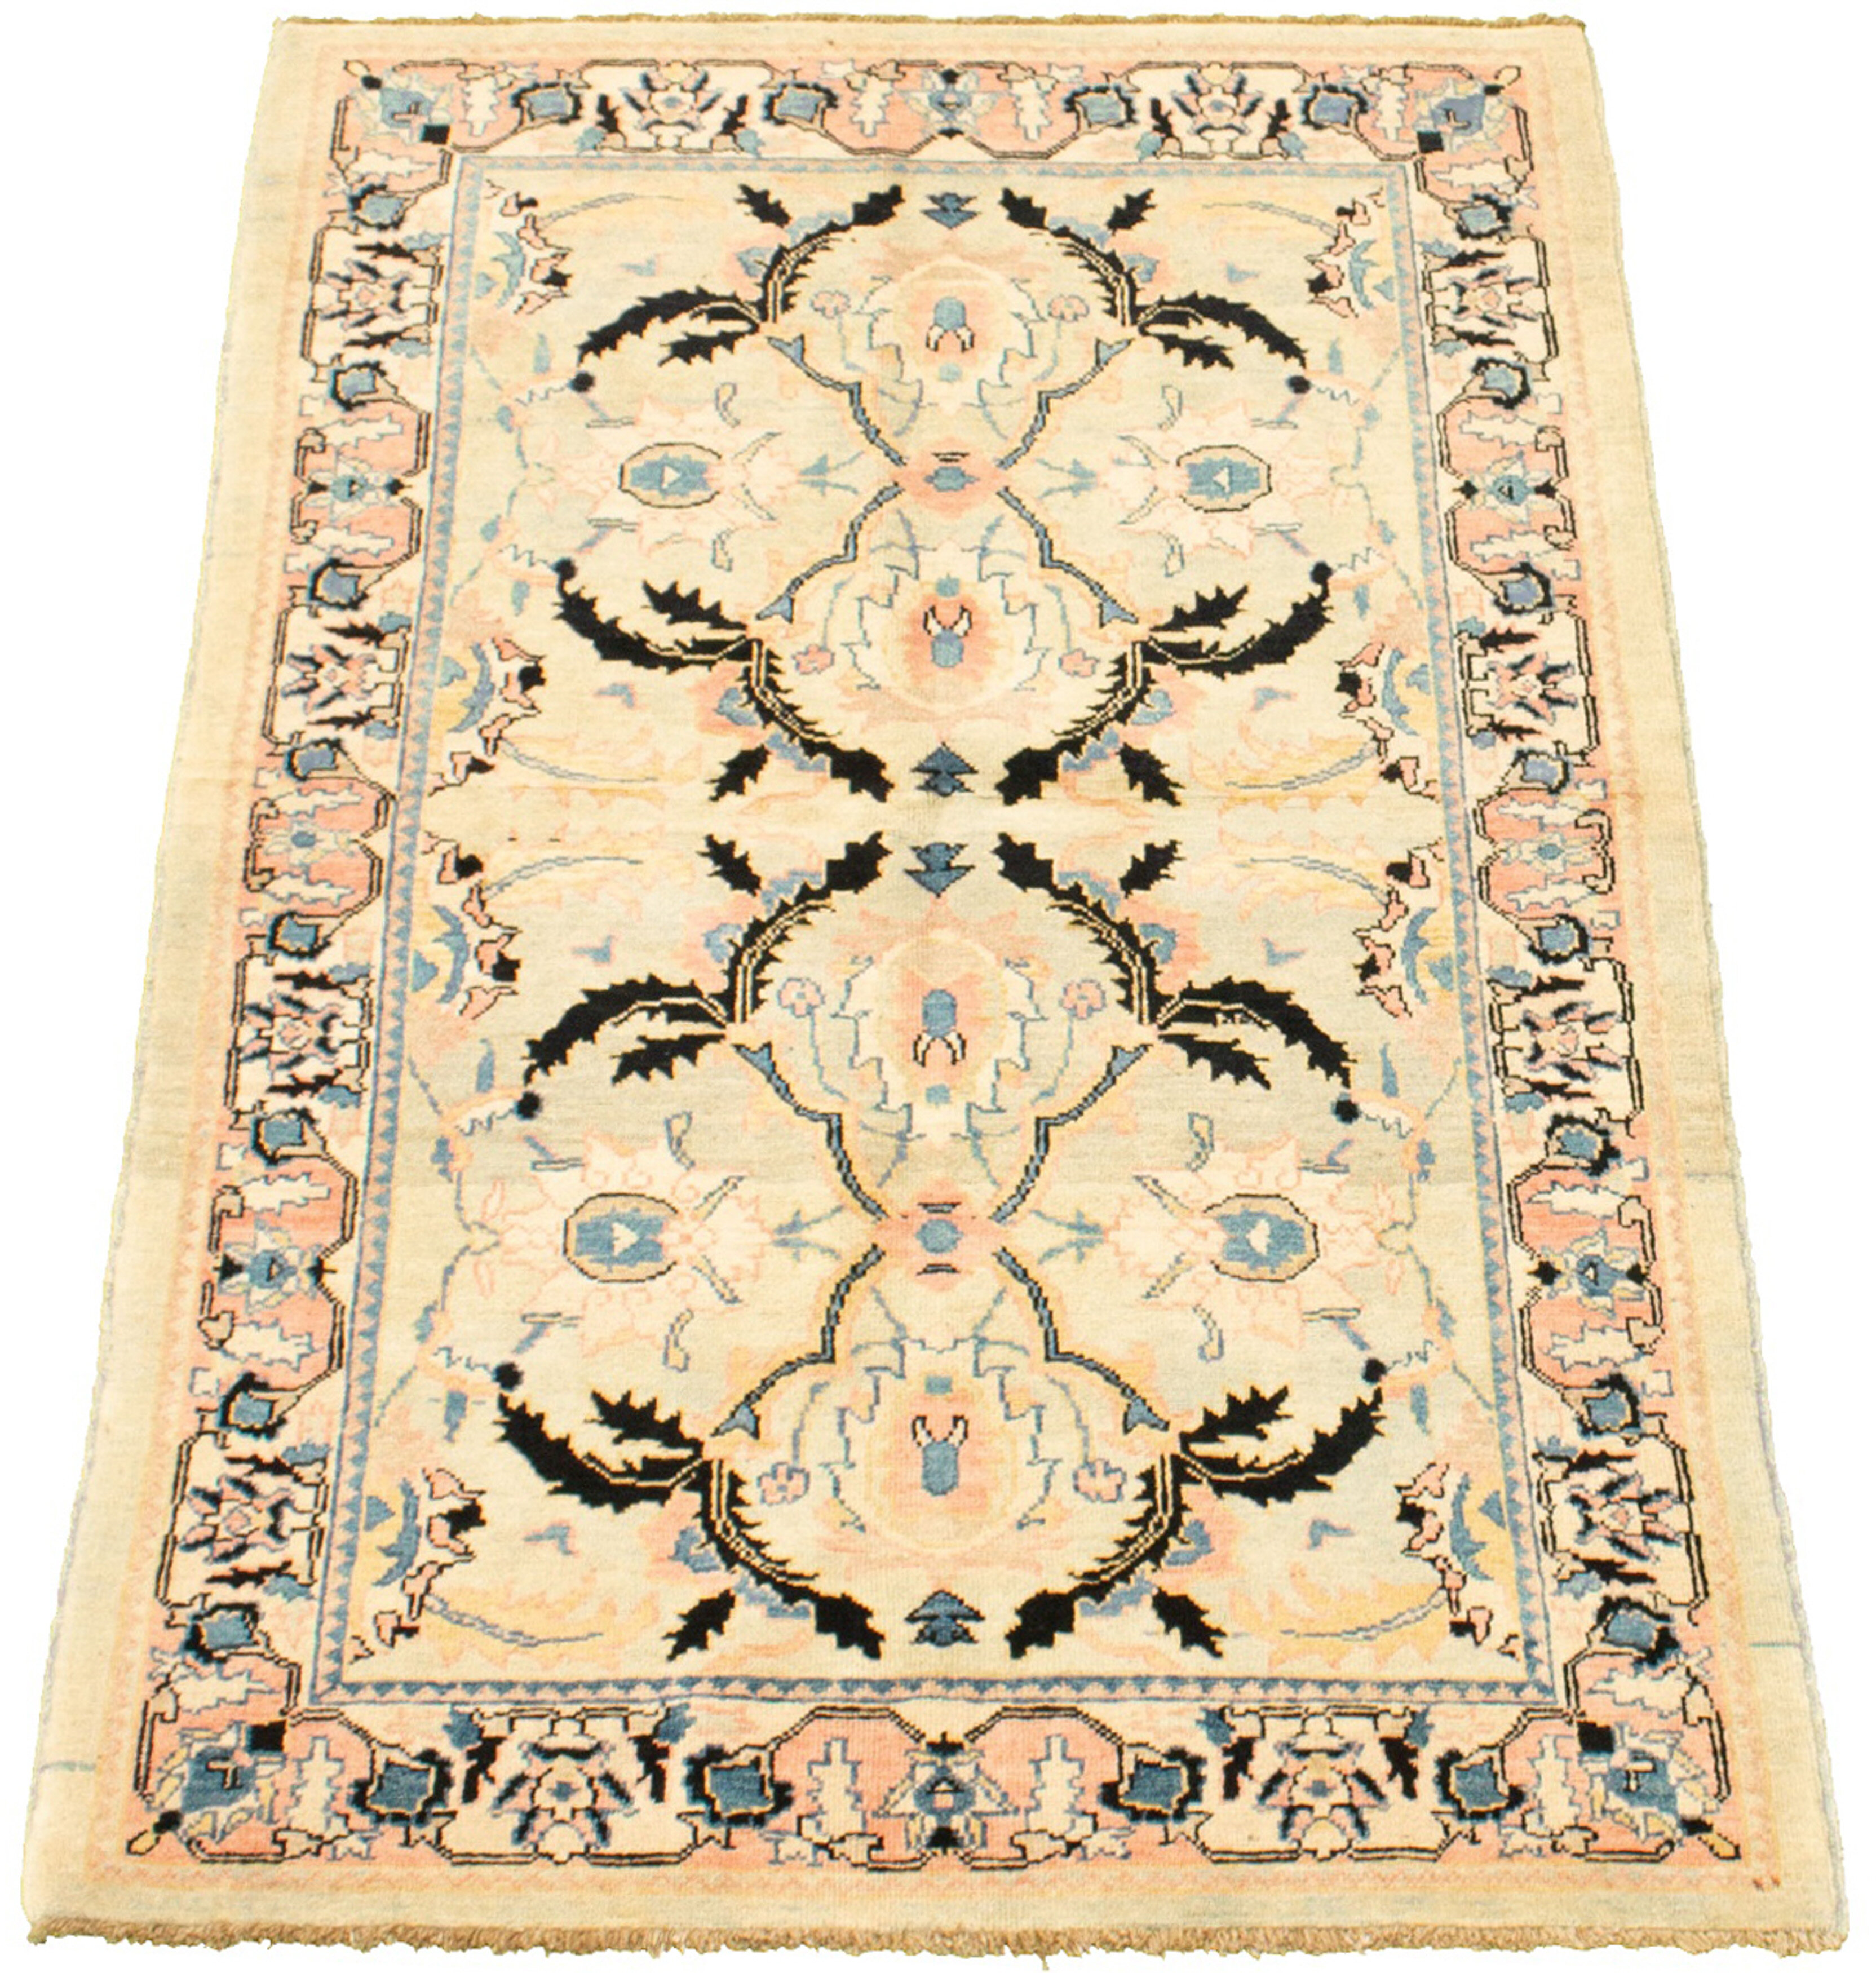 Isabelline One Of A Kind Hadara Hand Knotted 2010s Chobi Beige Khaki 4 4 X 5 10 Wool Area Rug Wayfair